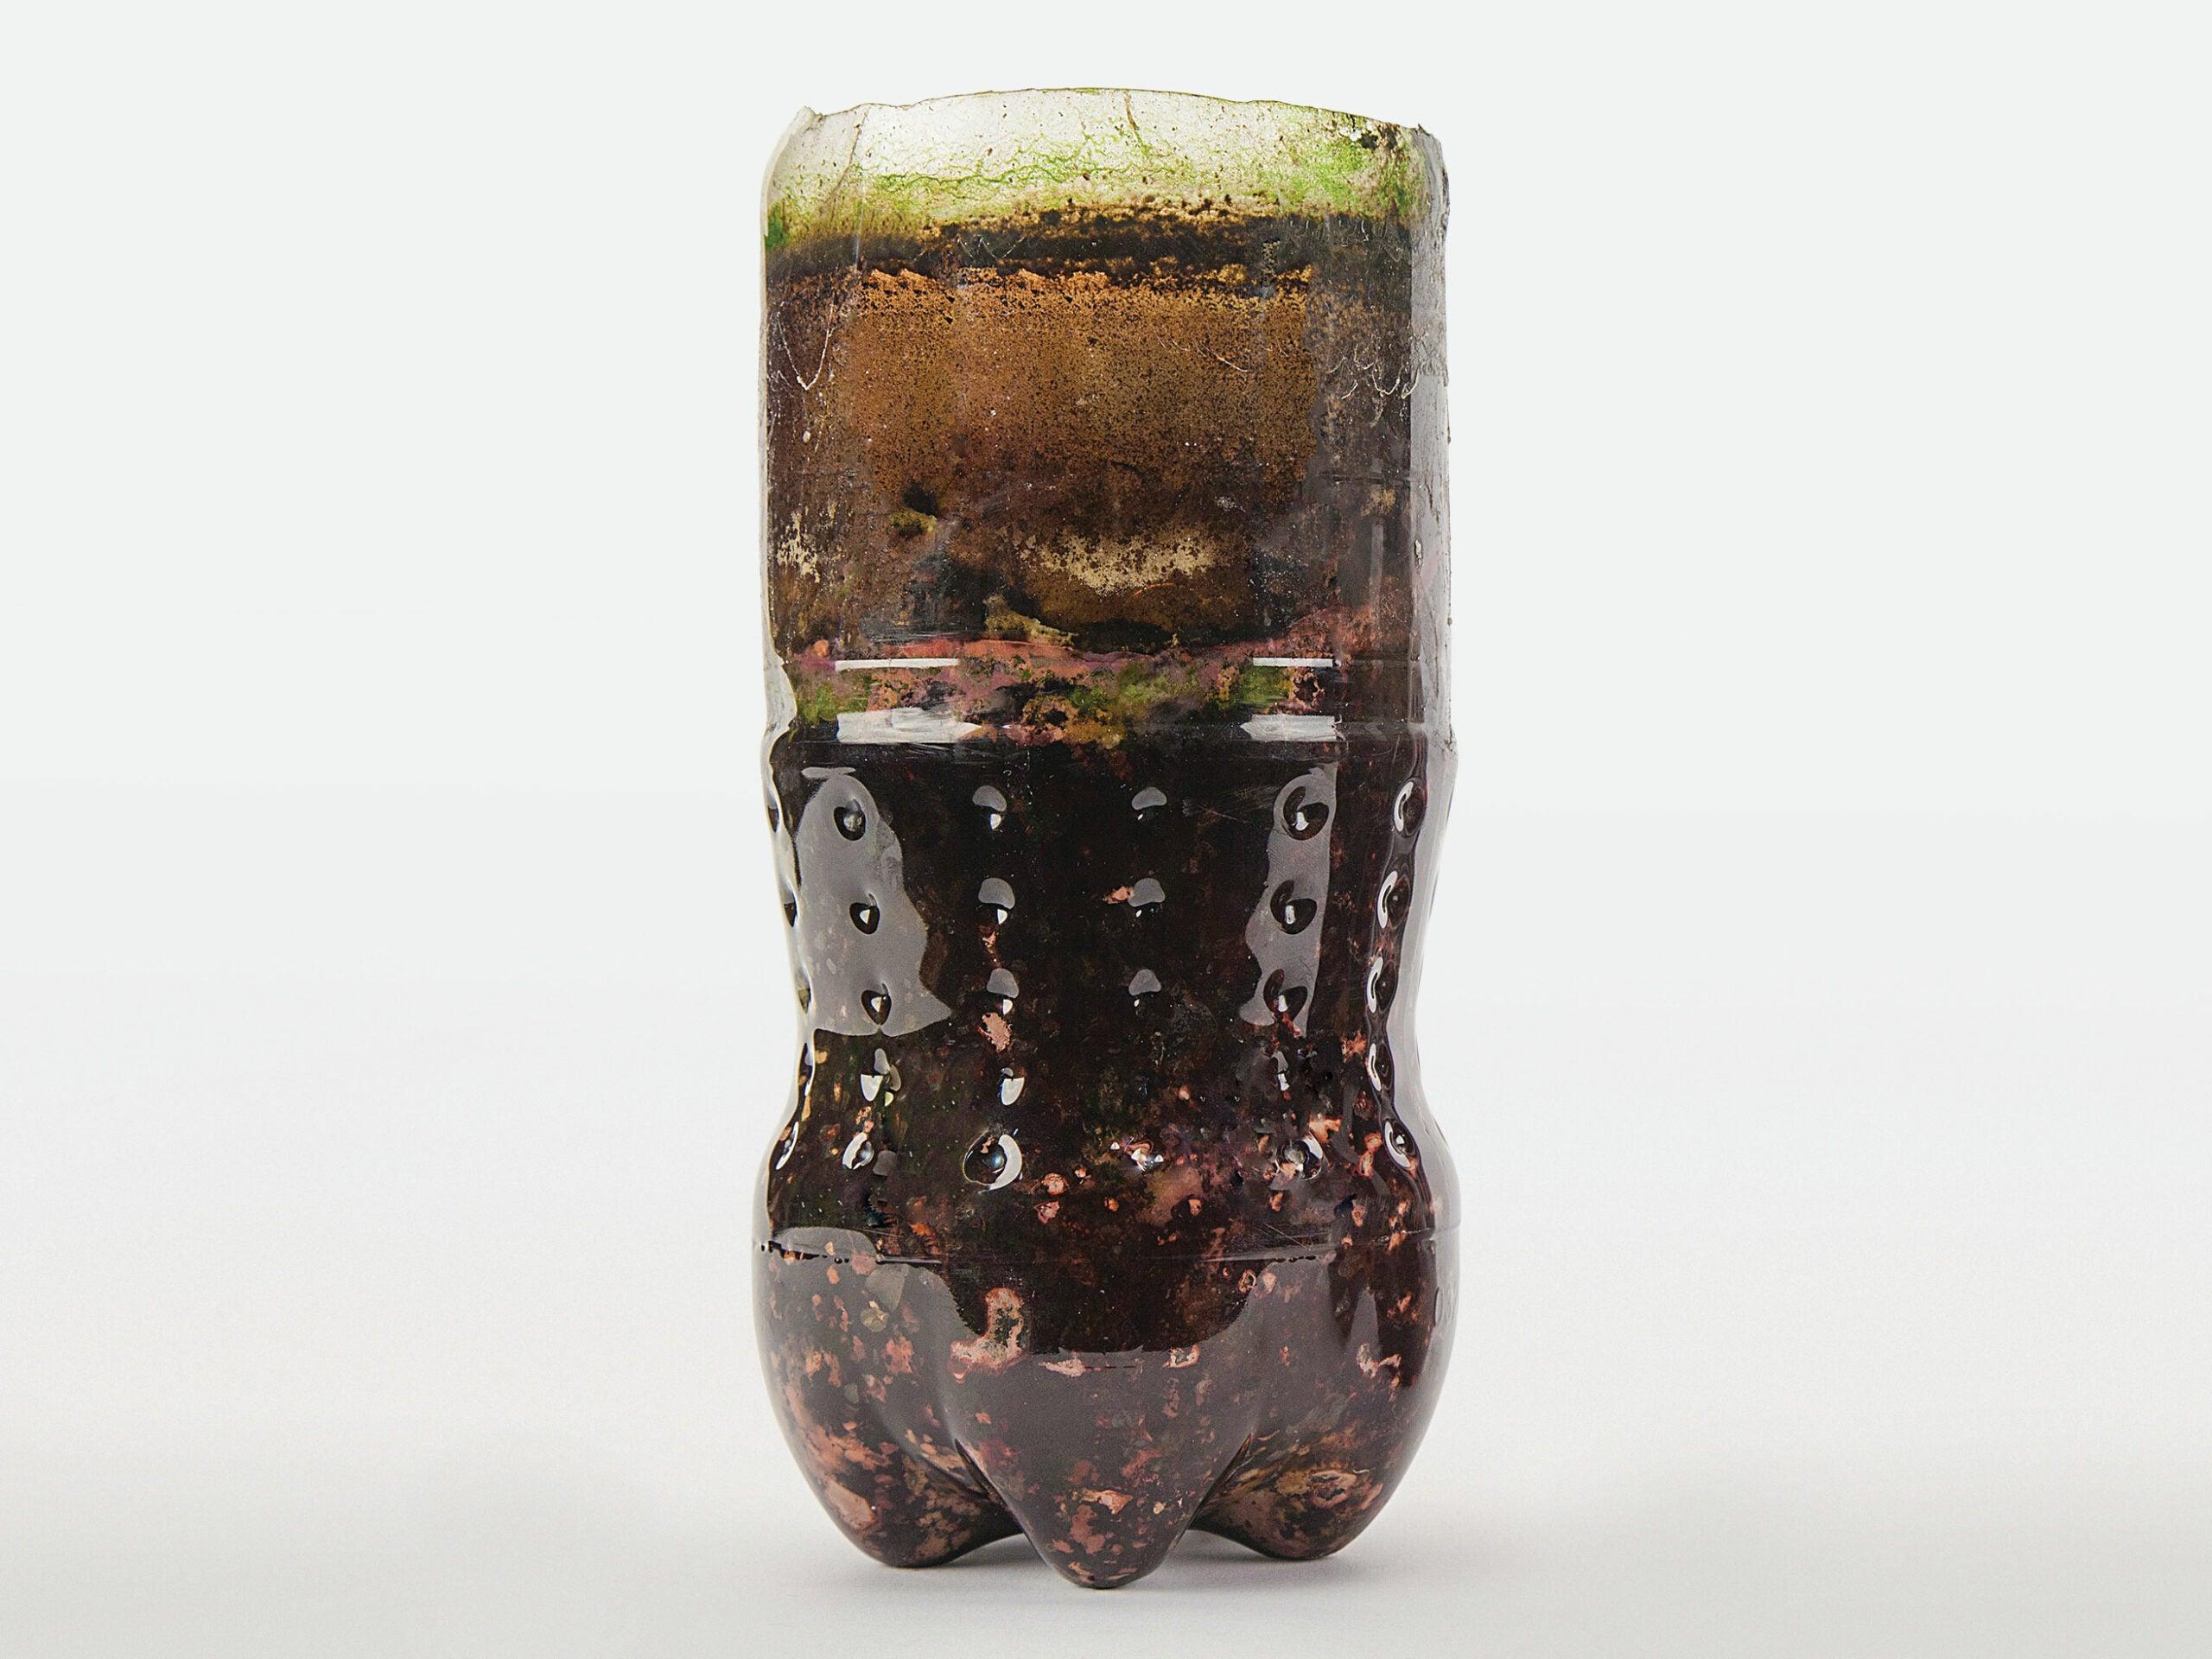 Grow A Bacterial Zoo In A Bottle